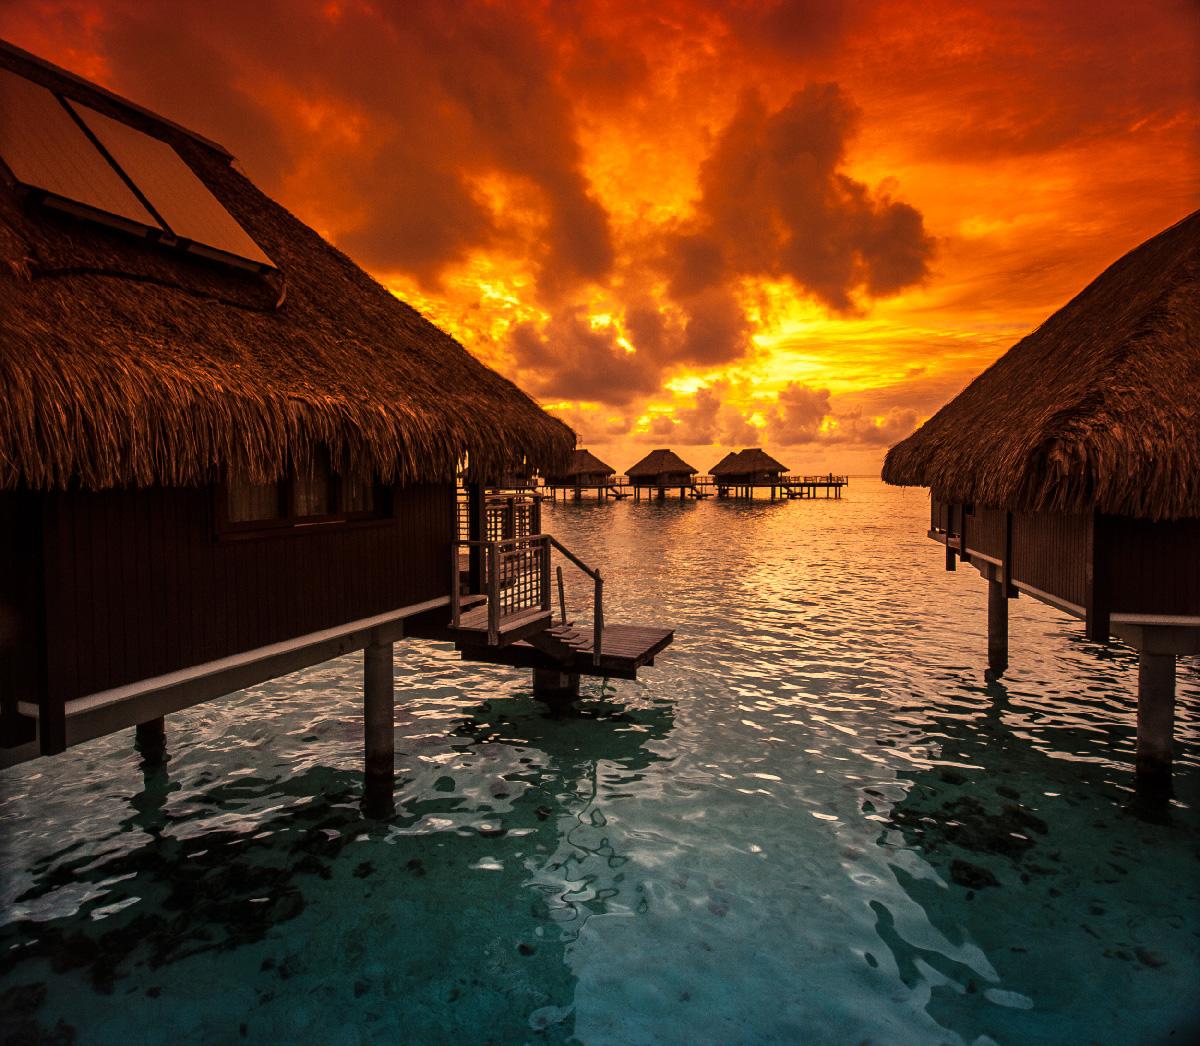 Brilliant sun display from Hilton Moorea, Tahiti